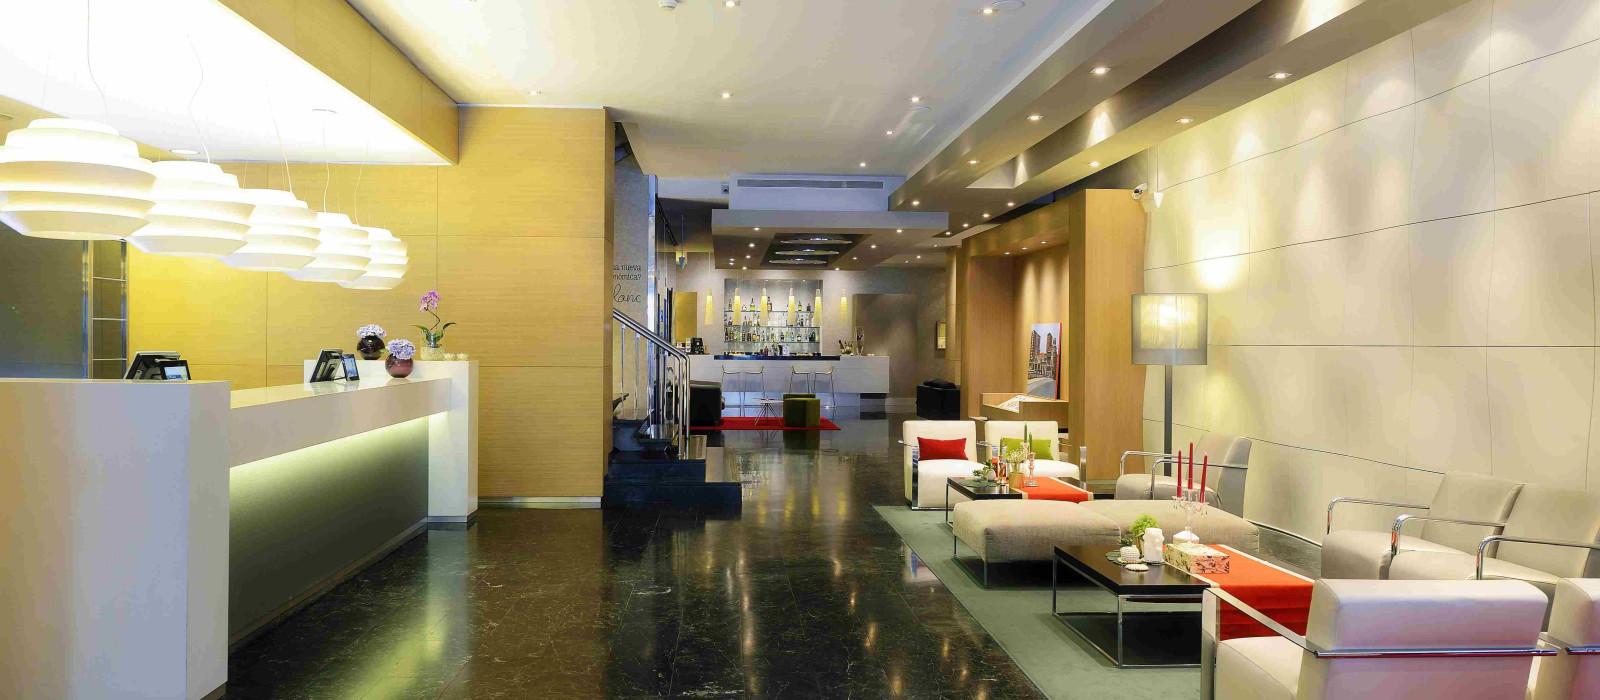 Hotel NH Collection Villa de Bilbao Spain